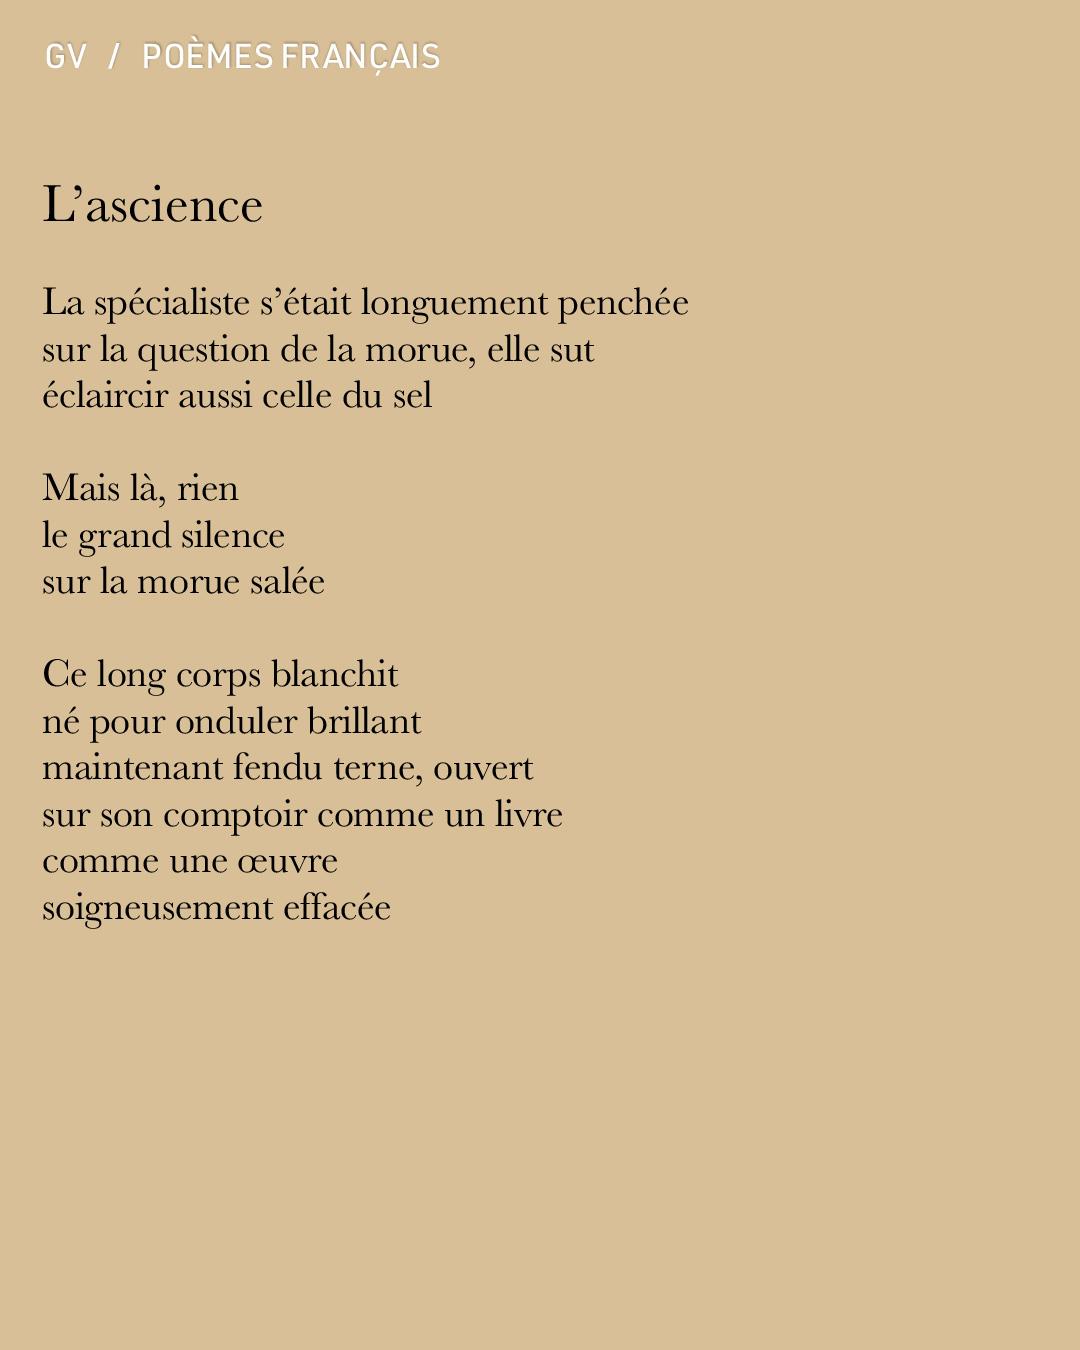 Gvion-PoemesF-Lascience.jpg